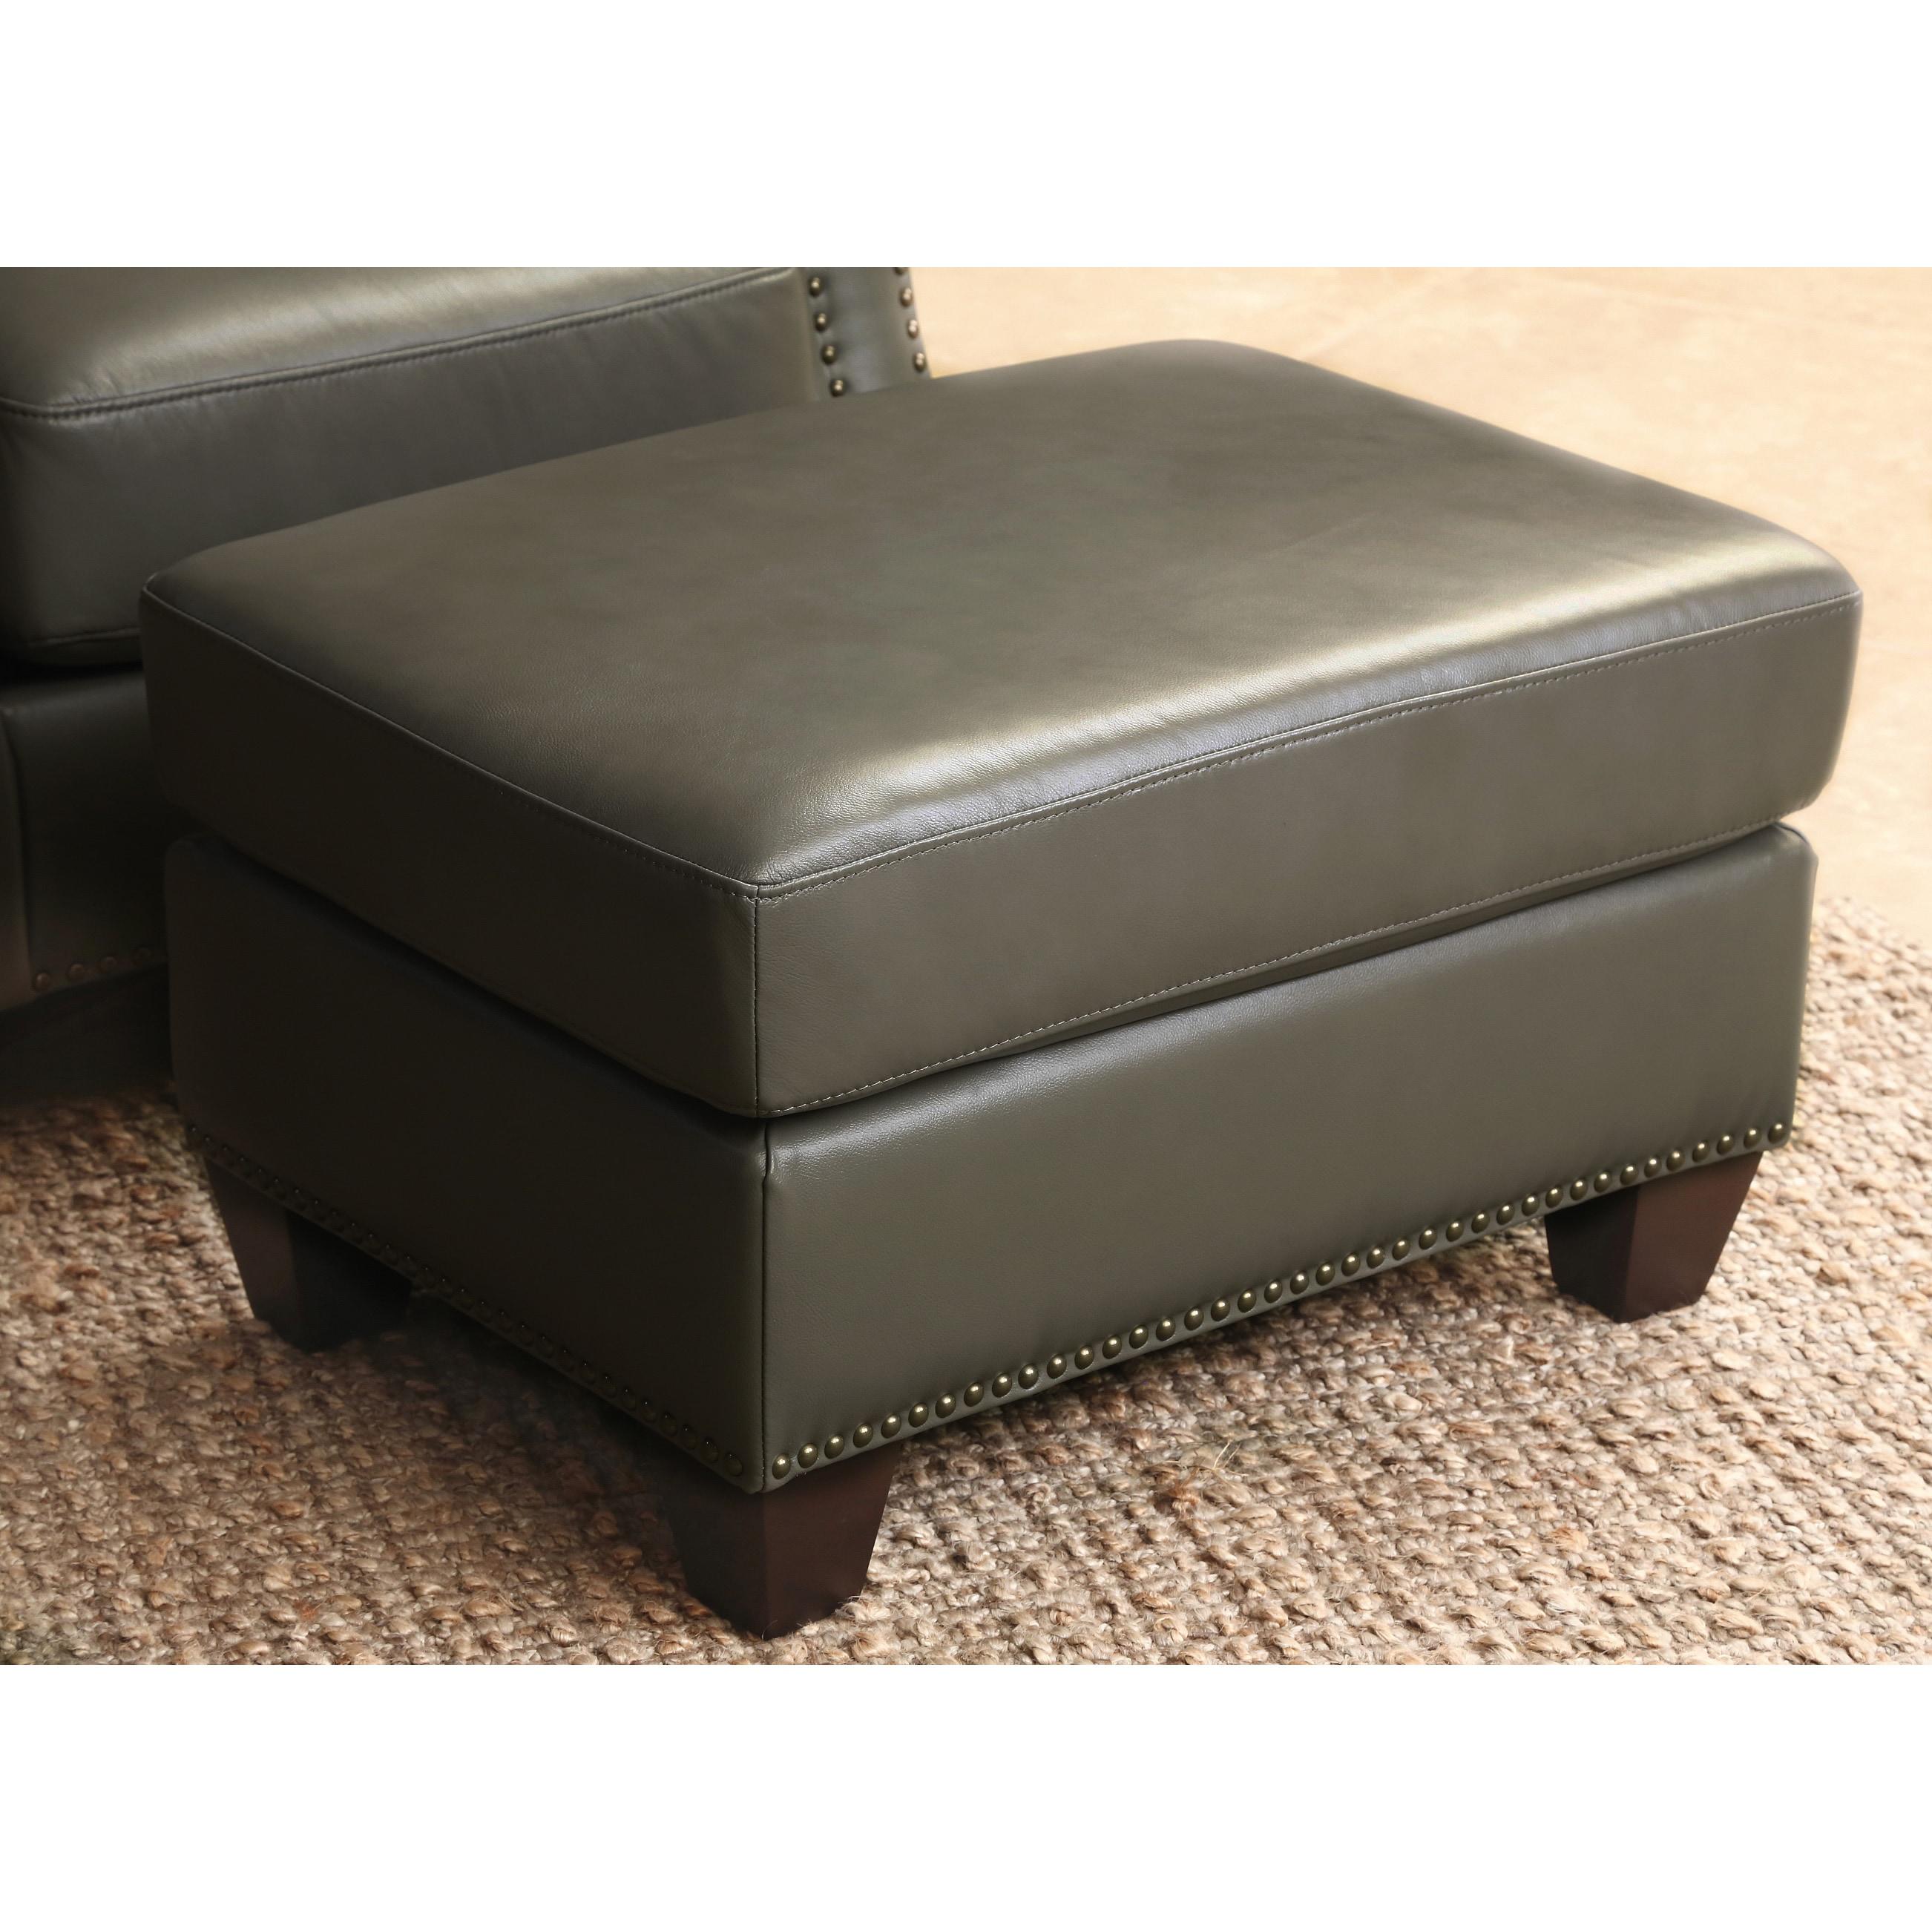 Best Abbyson Landon Top Grain Leather 4 Piece Living Room Set - Free  JB31